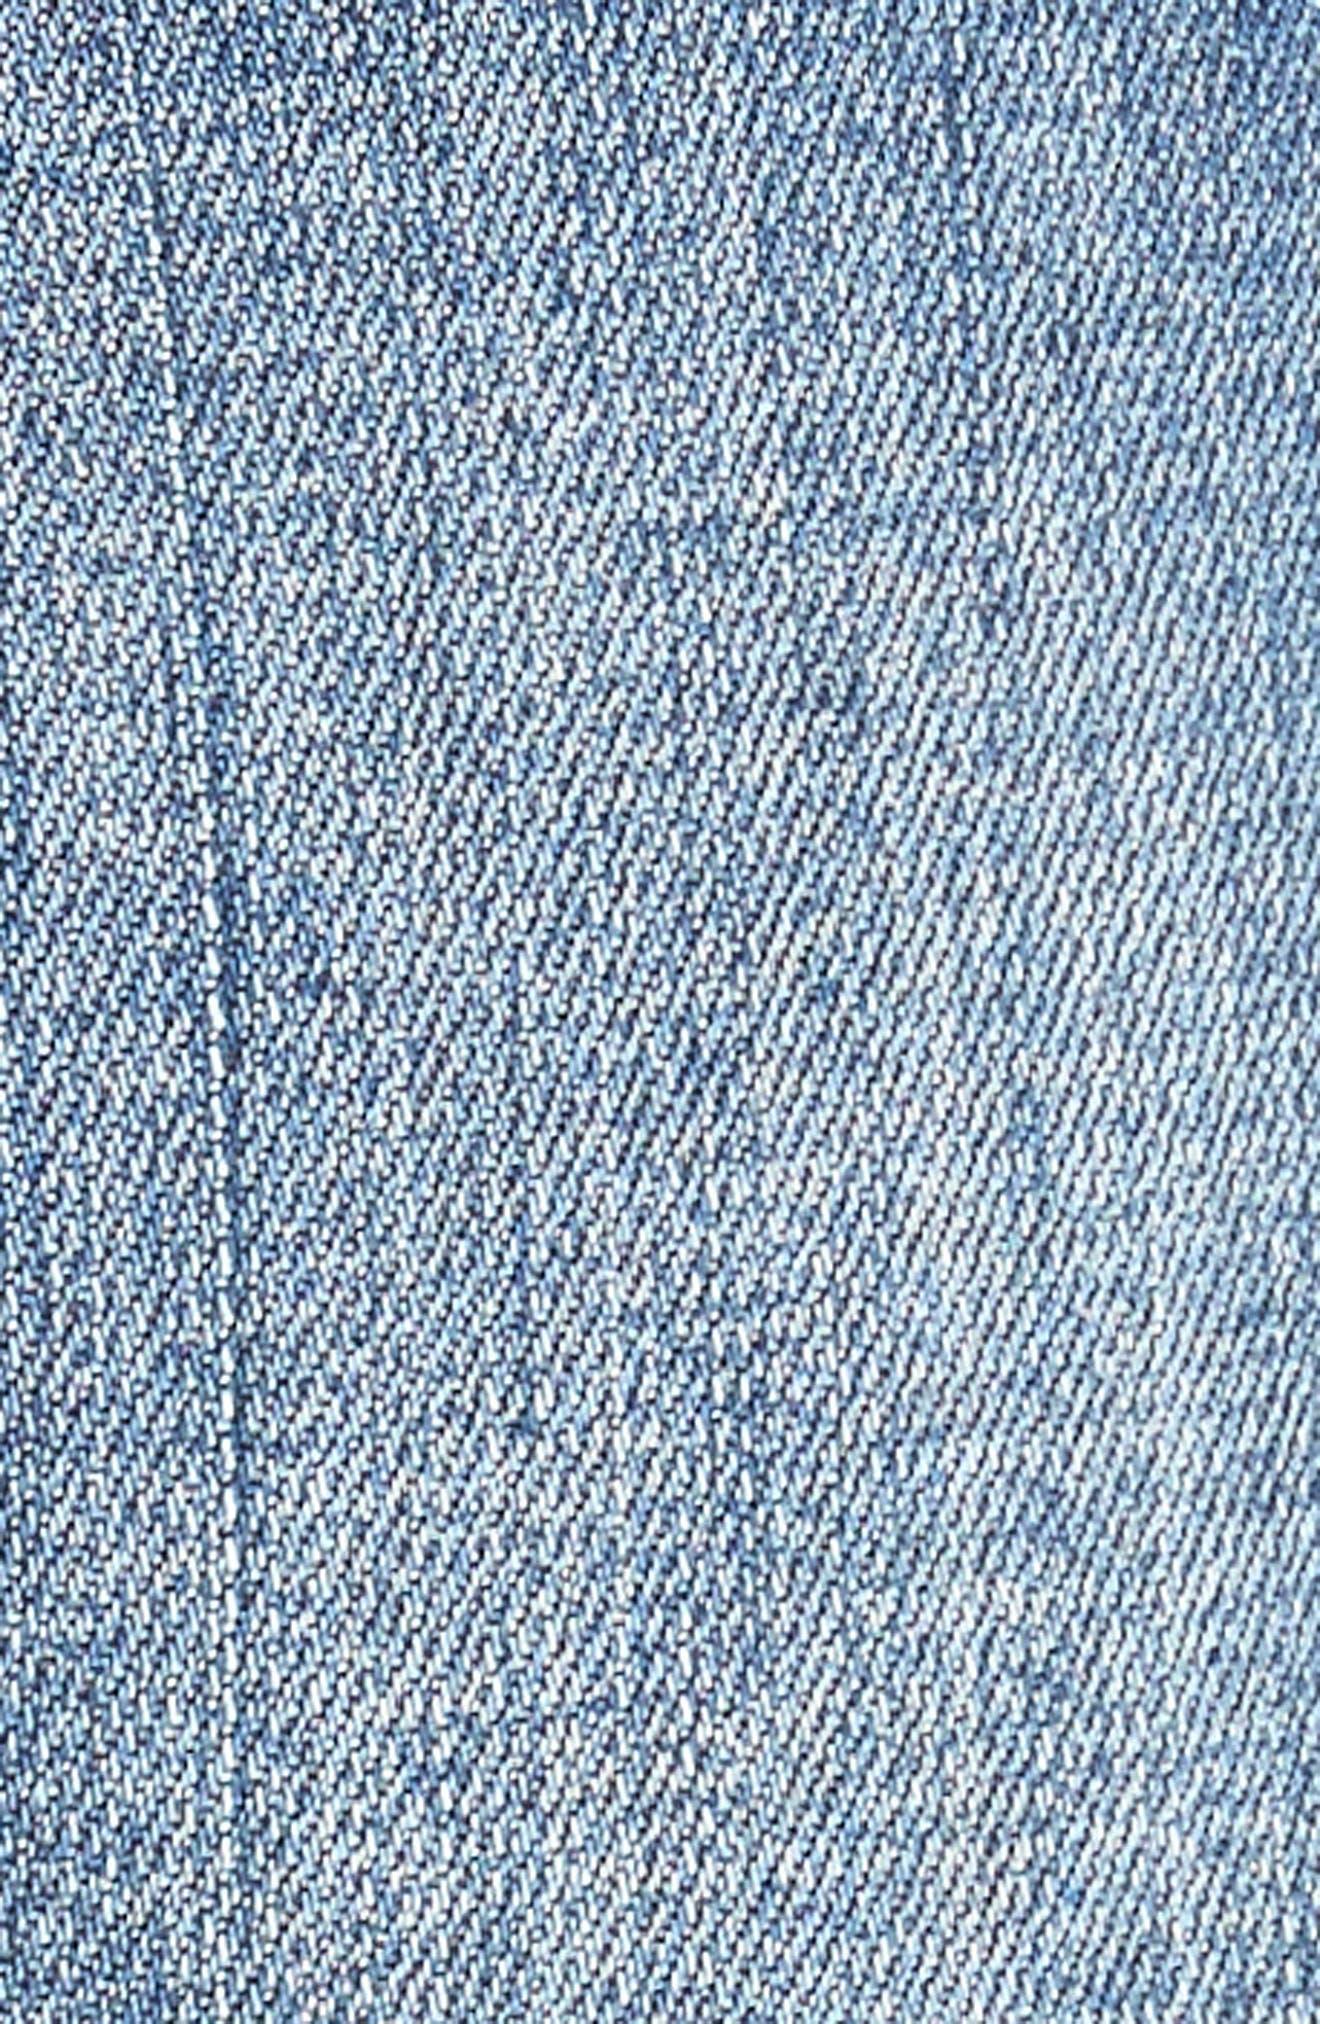 Gidget Denim Shorts,                             Alternate thumbnail 6, color,                             CONSOLIDATED